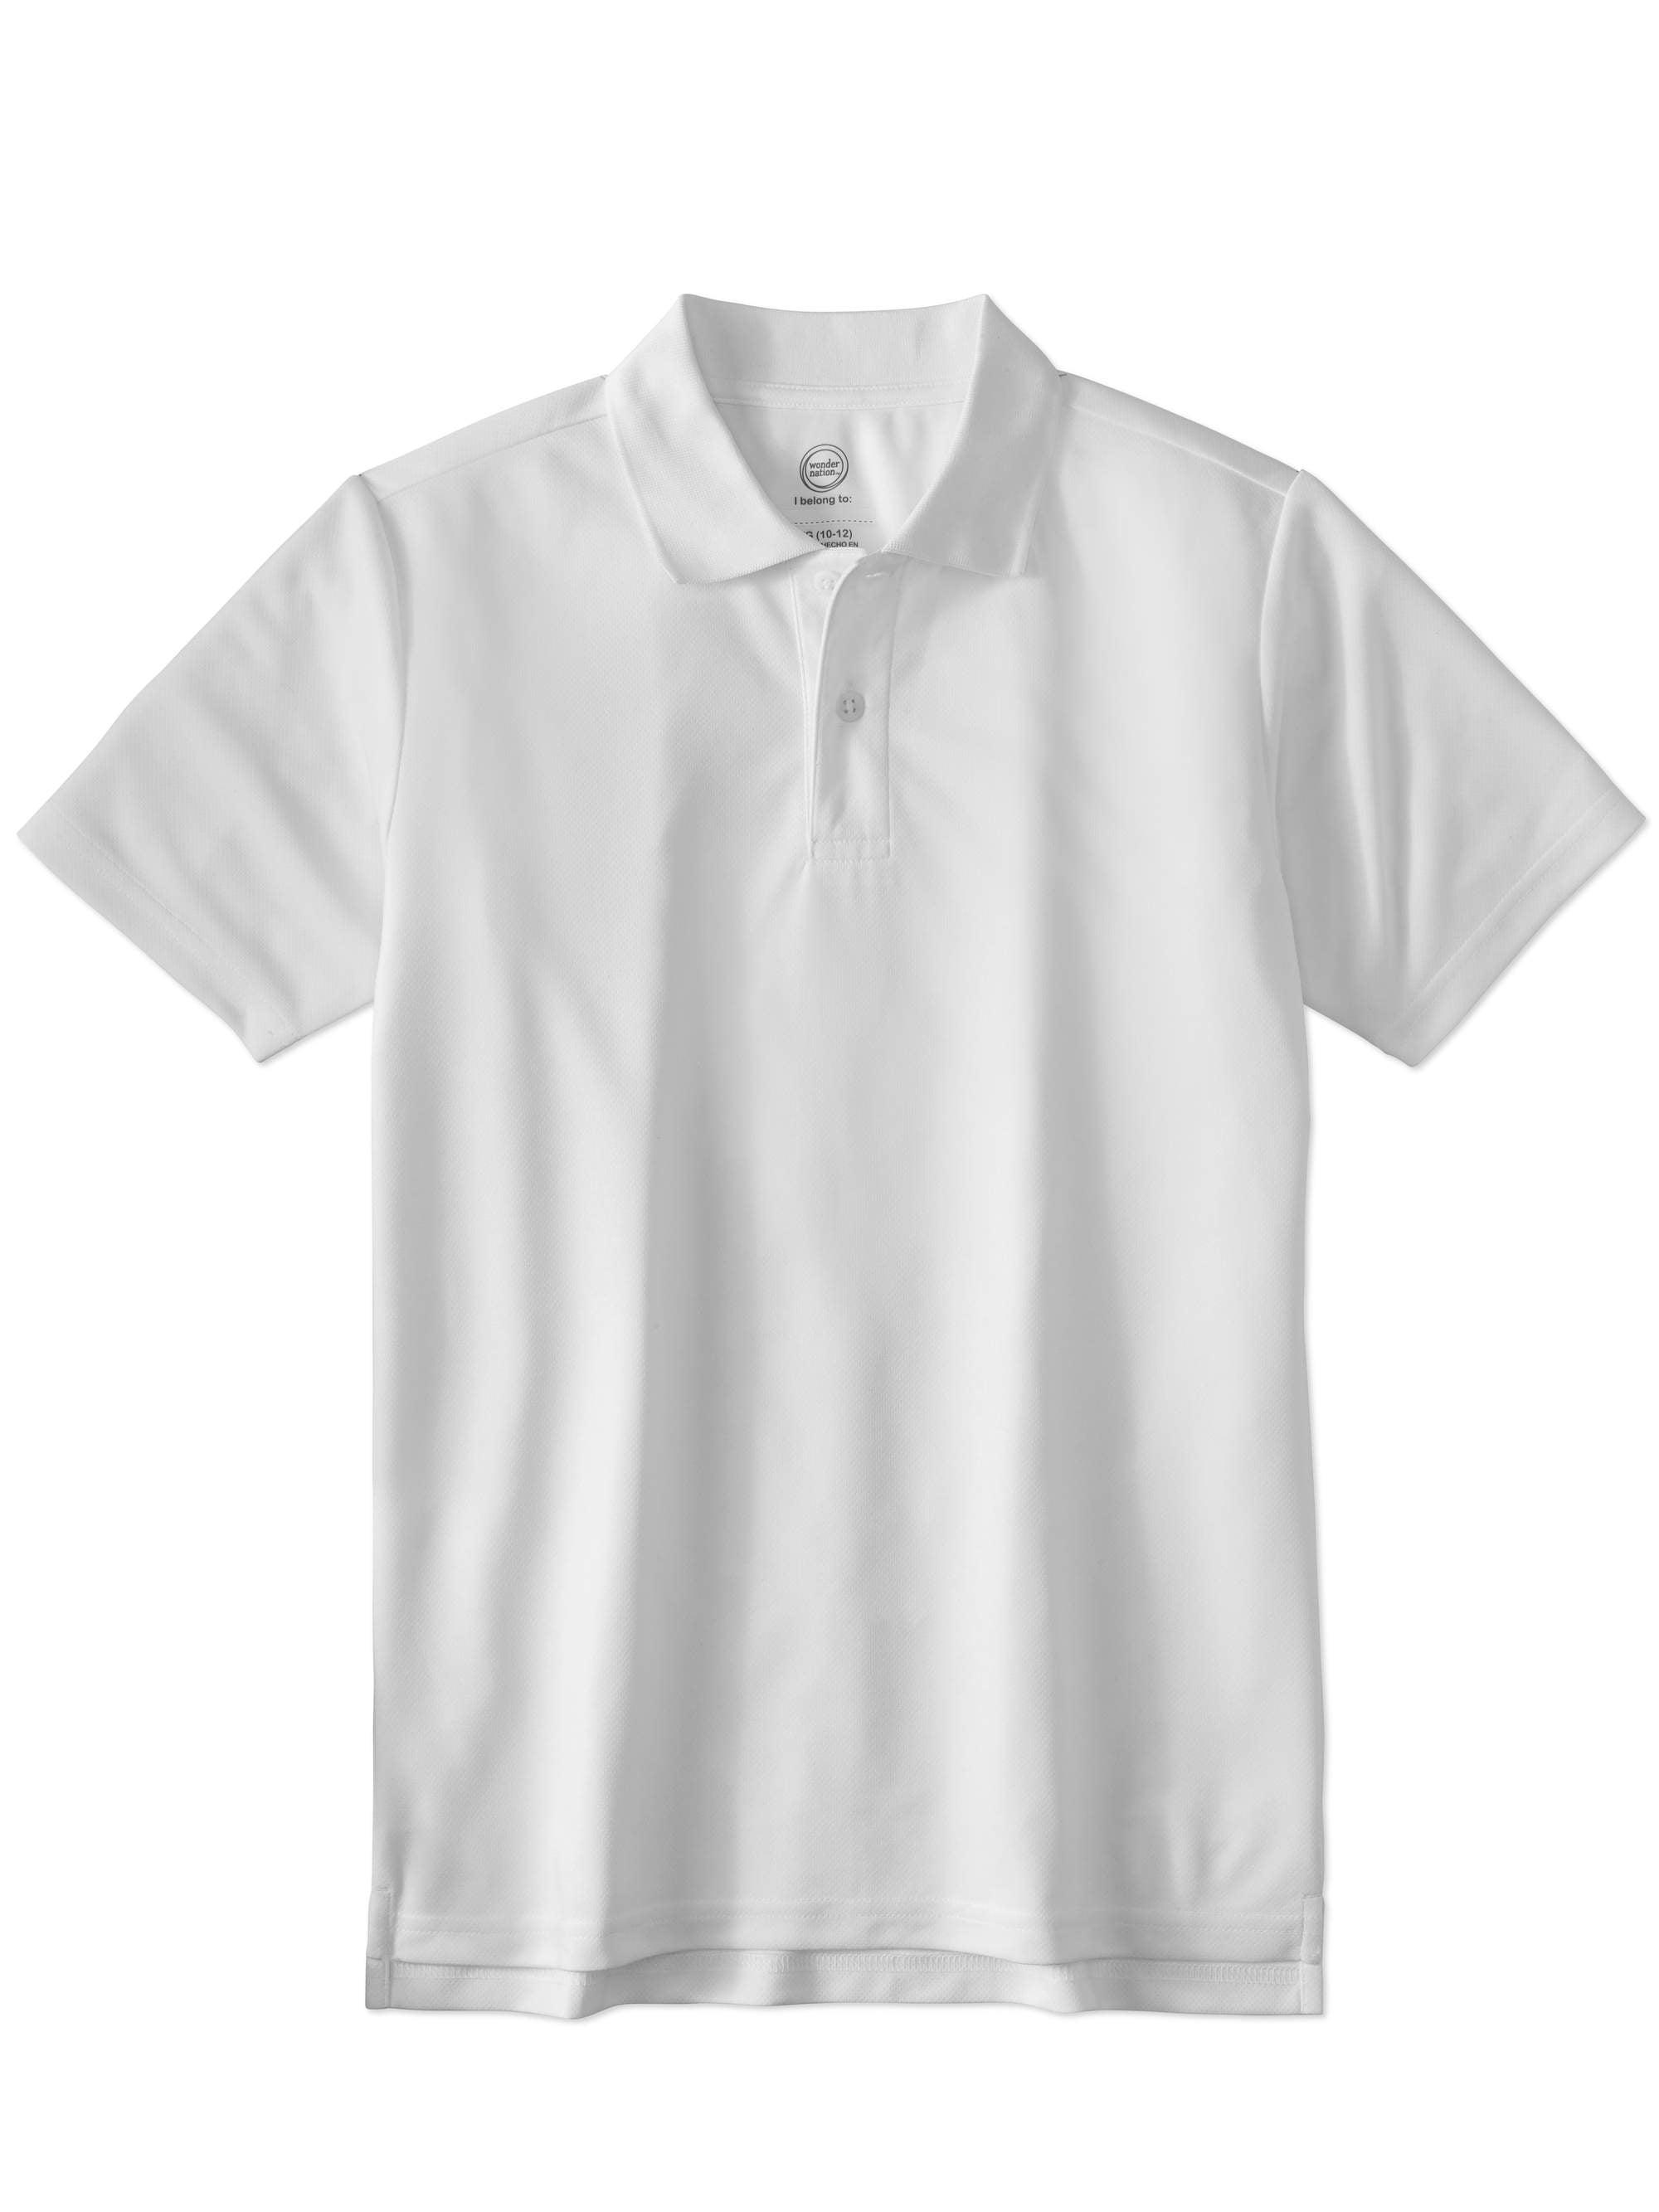 Boys School Uniform Short Sleeve Performance Polo